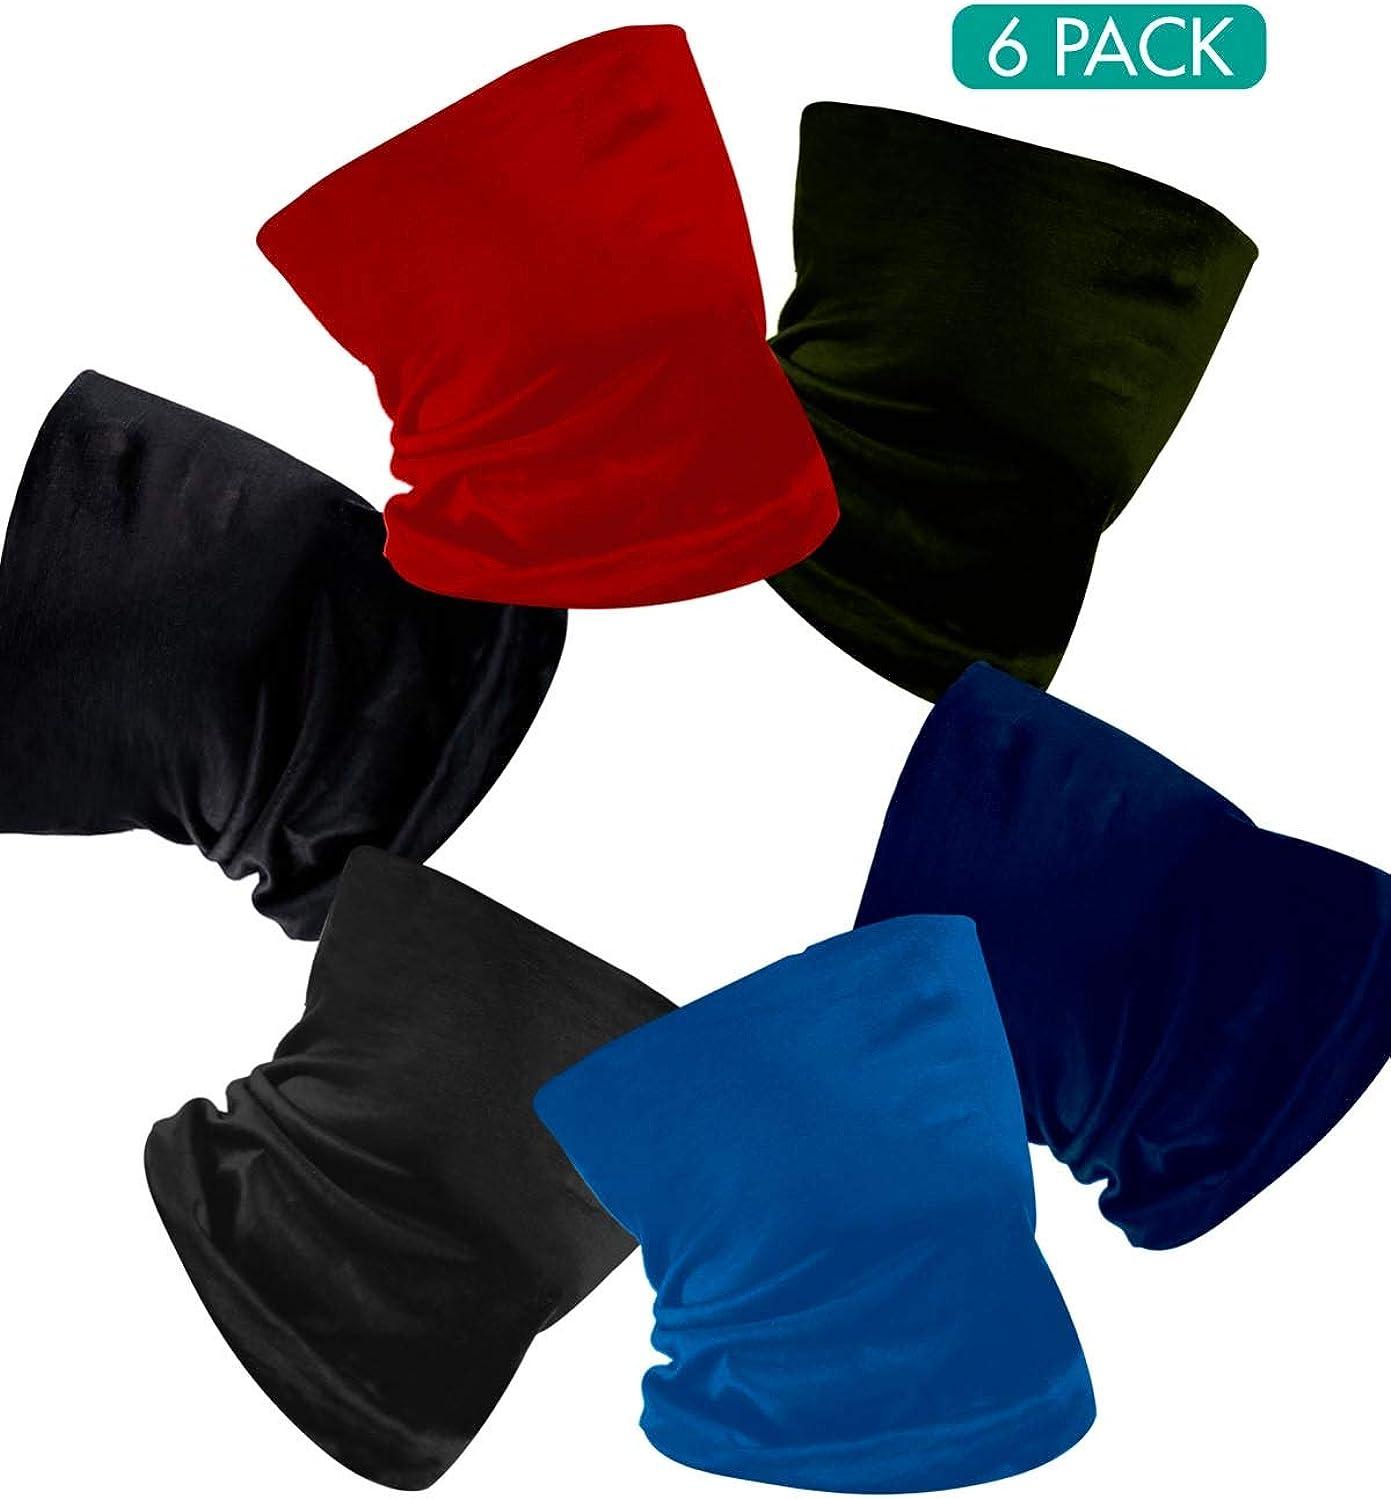 Headwrap Balaclava Face Scarf Mask-Dust for Outdoor Sport Headwear Headband Bandana Neck Gaiters